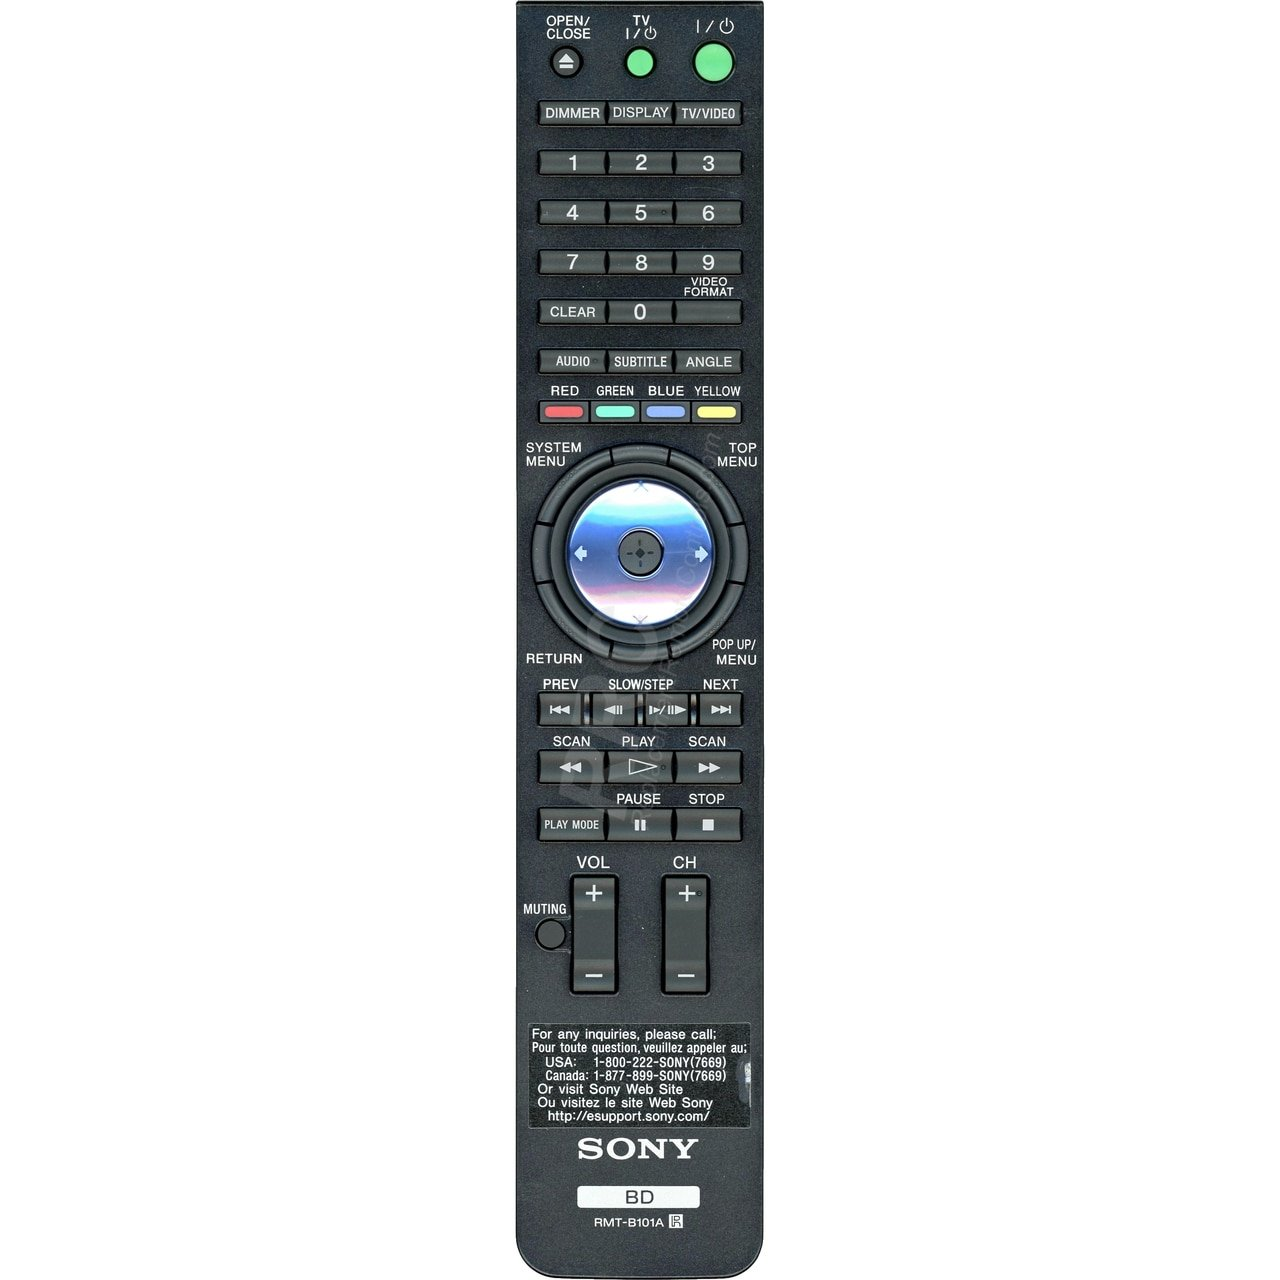 Genuine Sony RMT-B101A DVD/ Blu-ray Player Remote Control